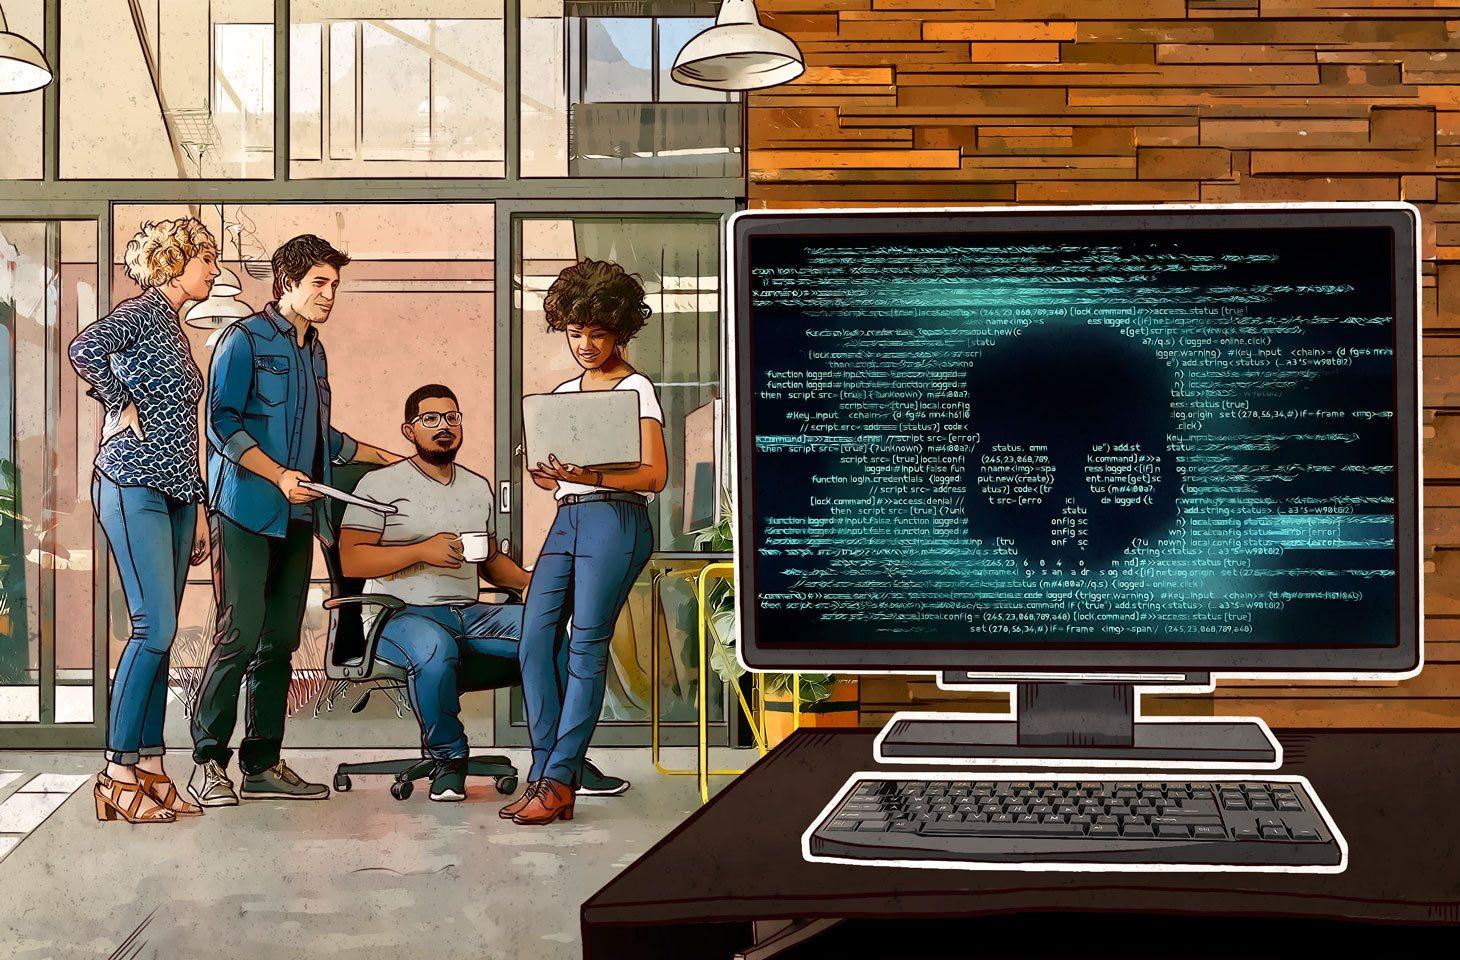 kaspersky.com - Startups and information security